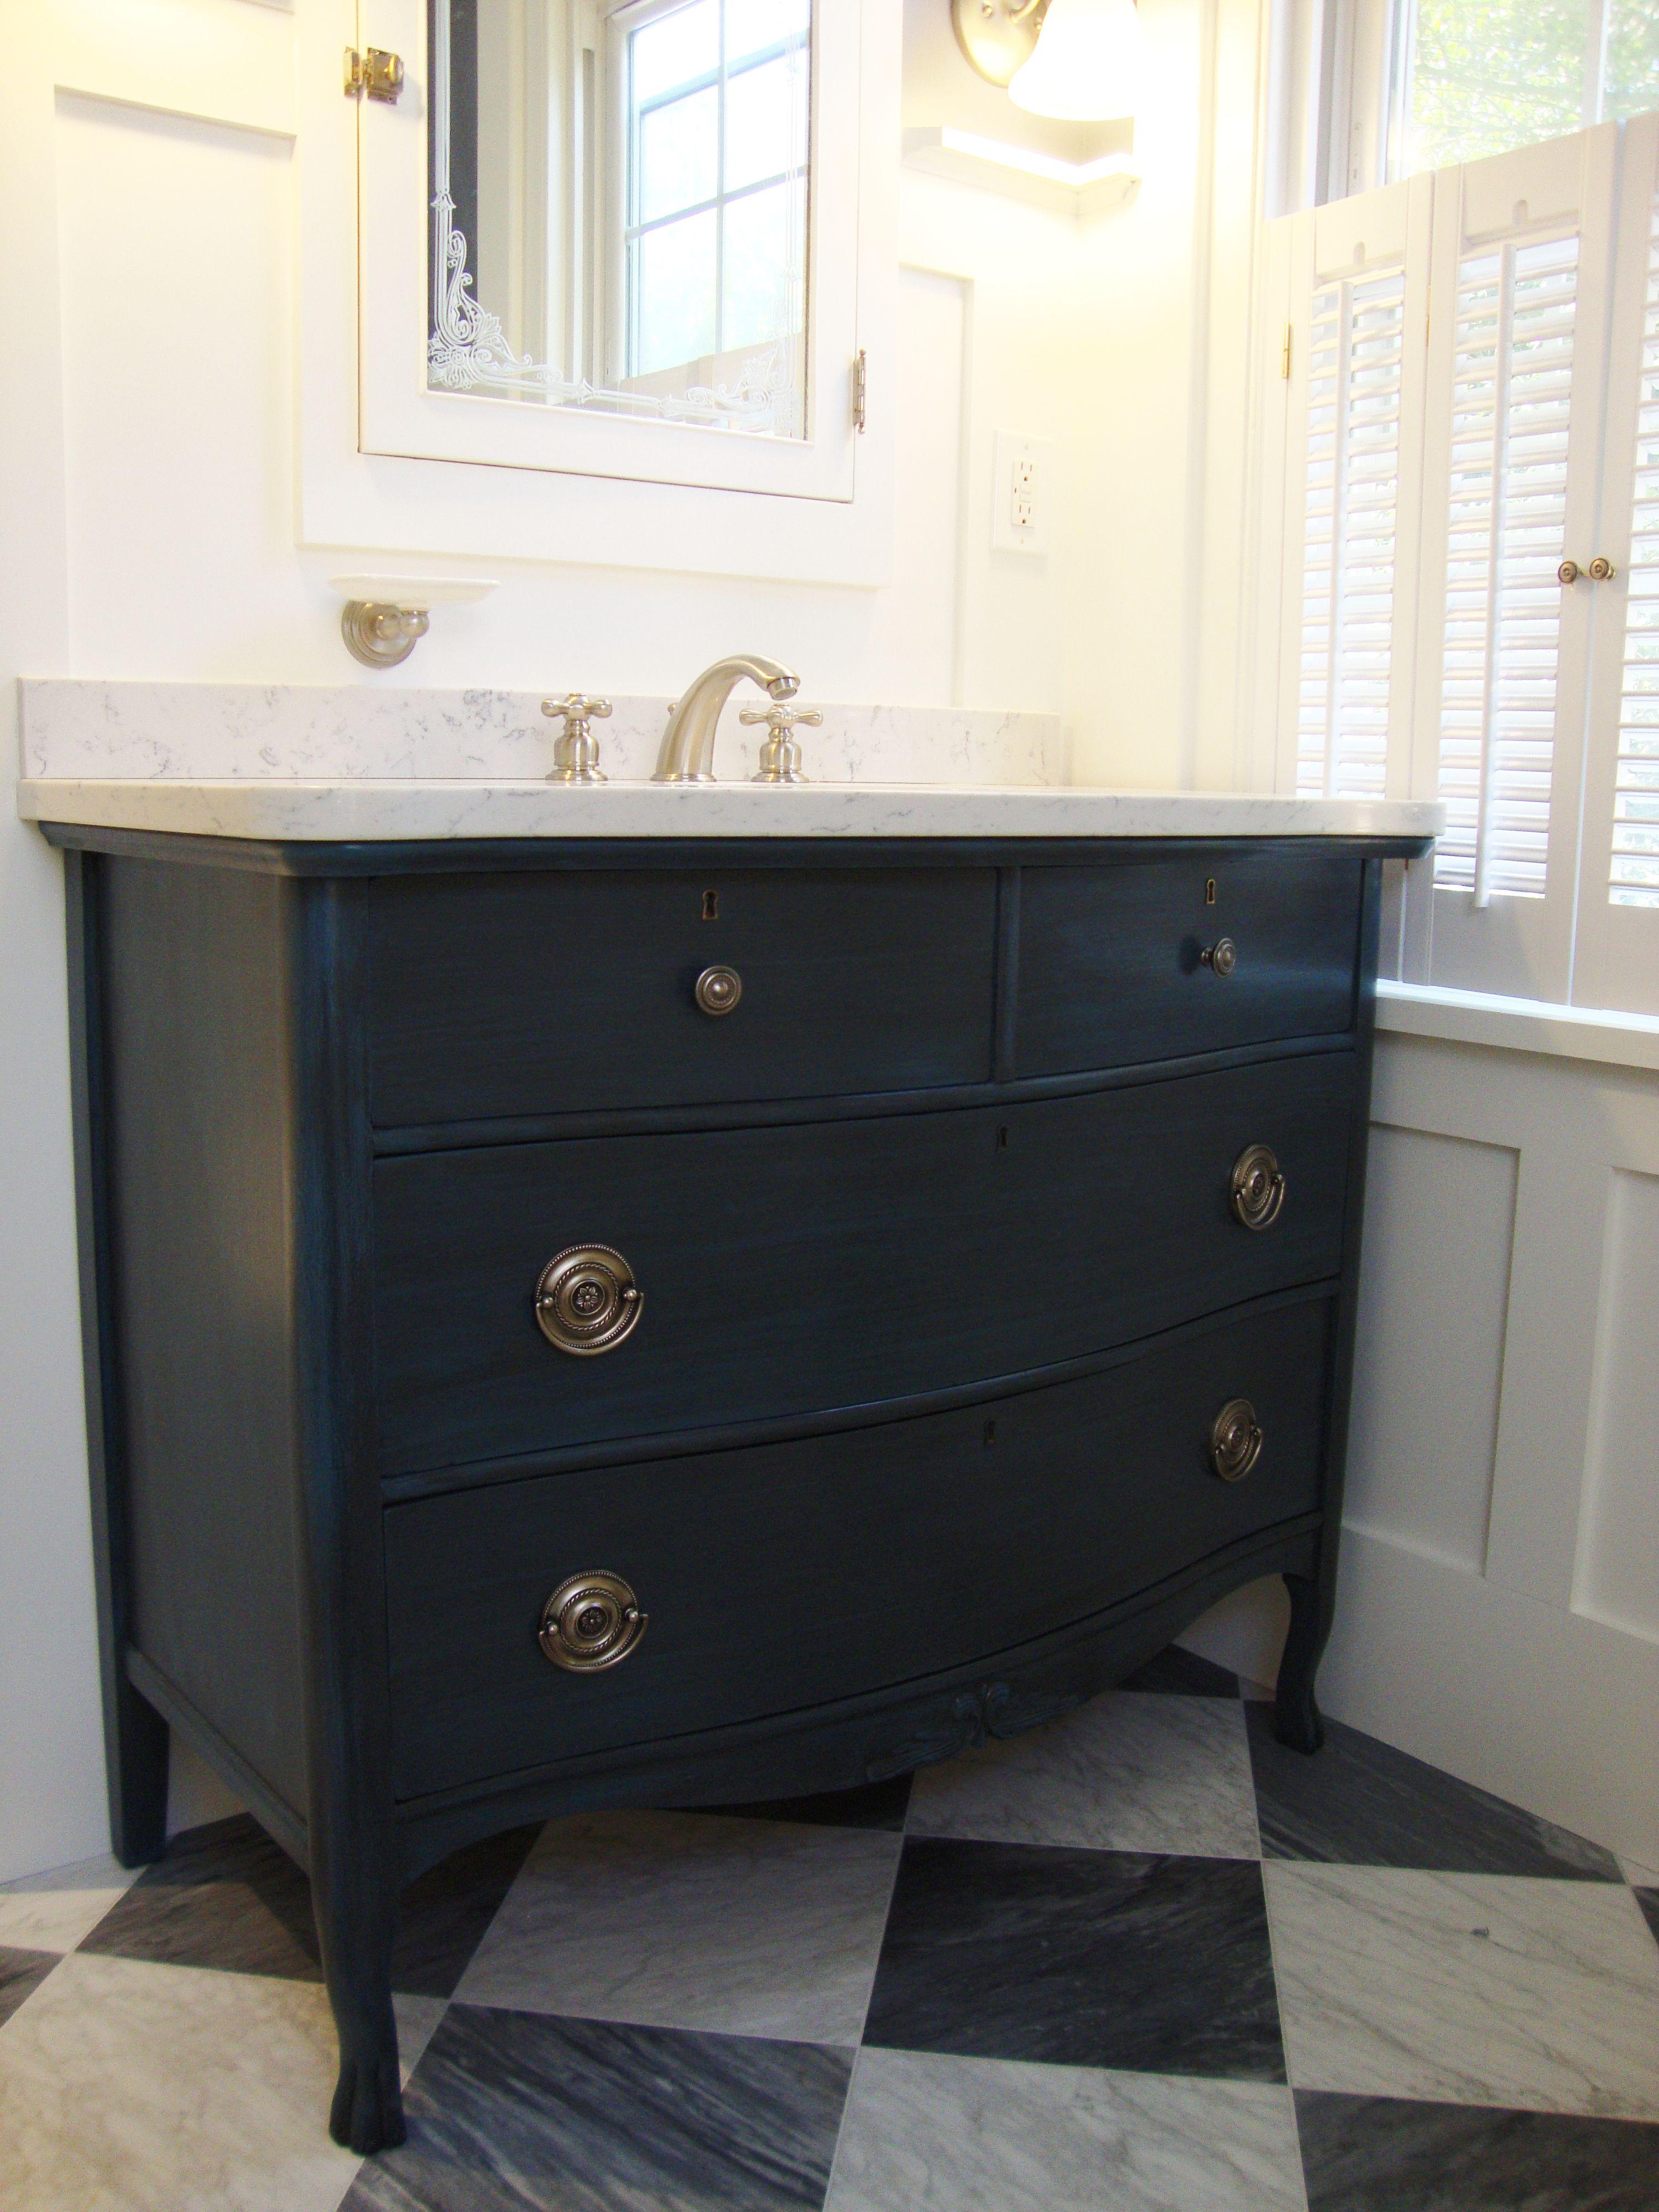 avenue centrale vanity is a repurposed antique serpentine dresser rh pinterest com